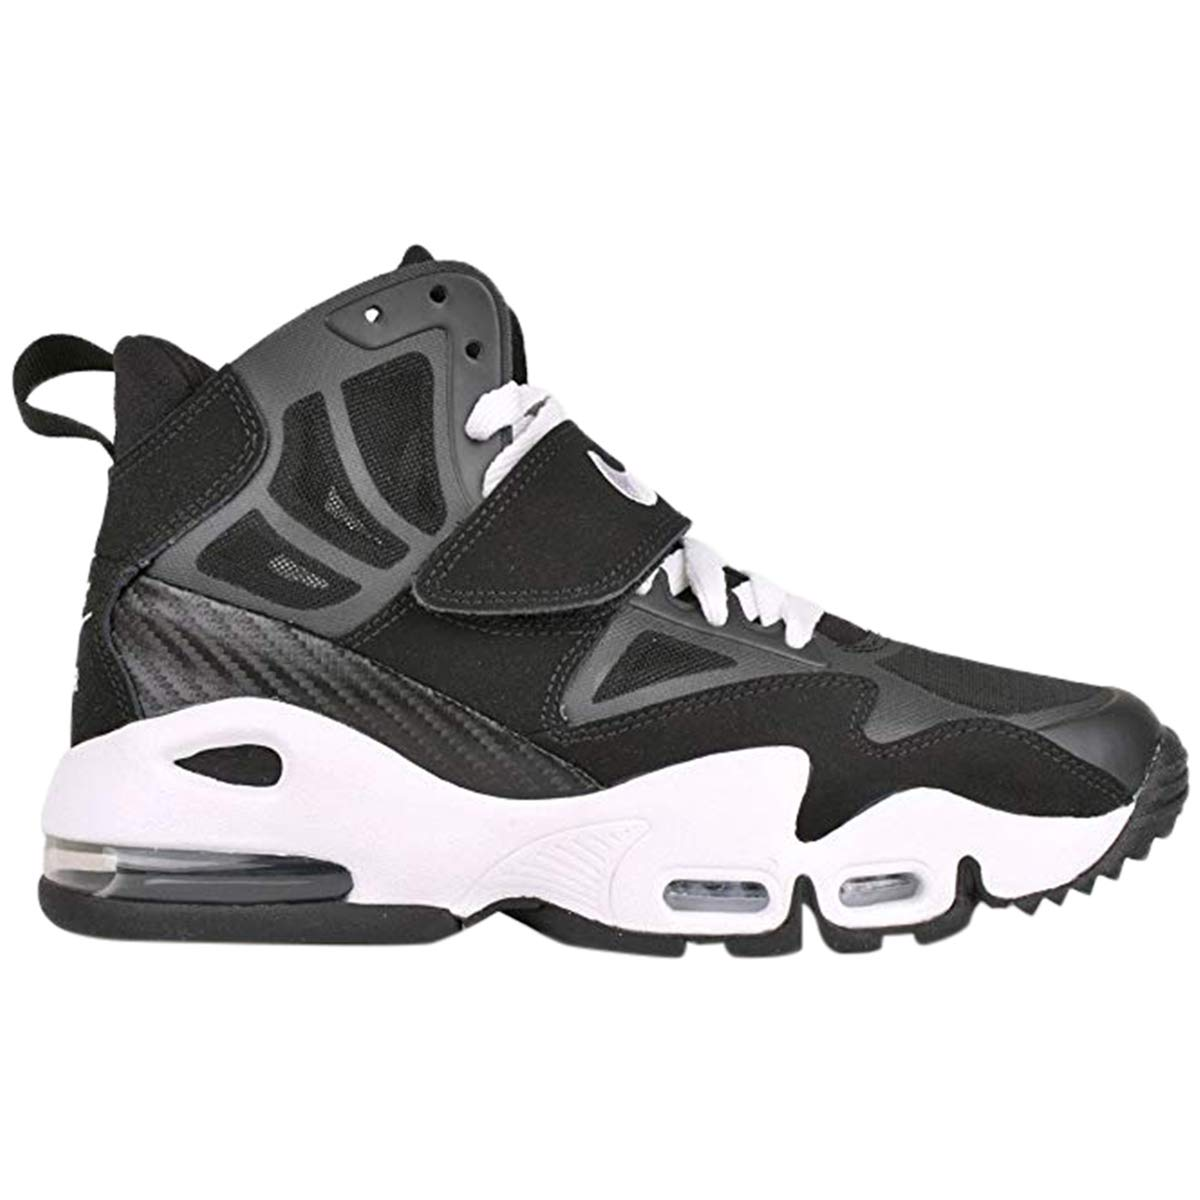 Nike Air Max Express (Gs) Big Kids Style: 525254-003 Size: 6 Black///White